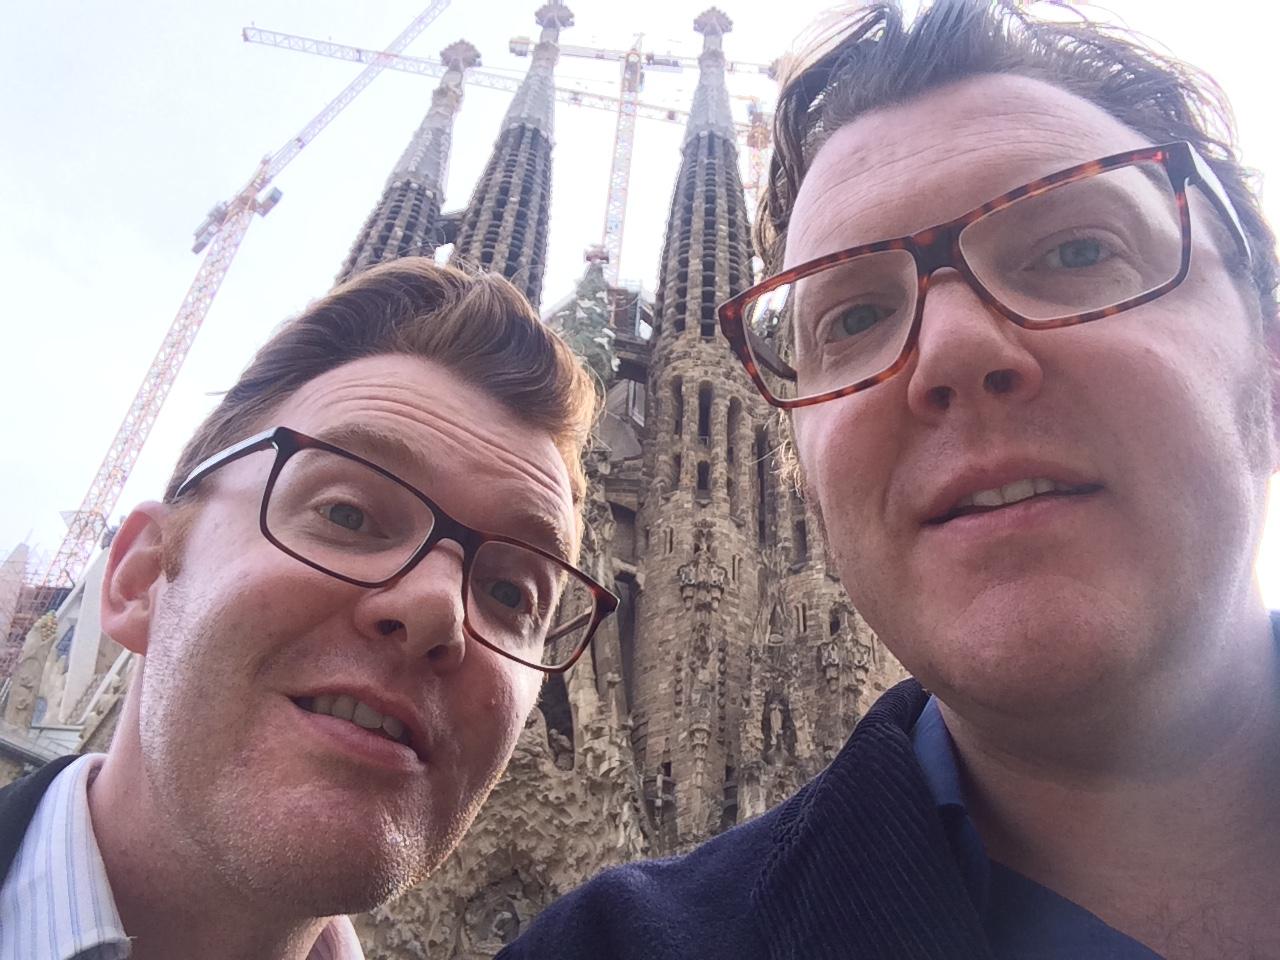 Ed Shearer and Matt Shearer at Segrada Familia - by Gaudi